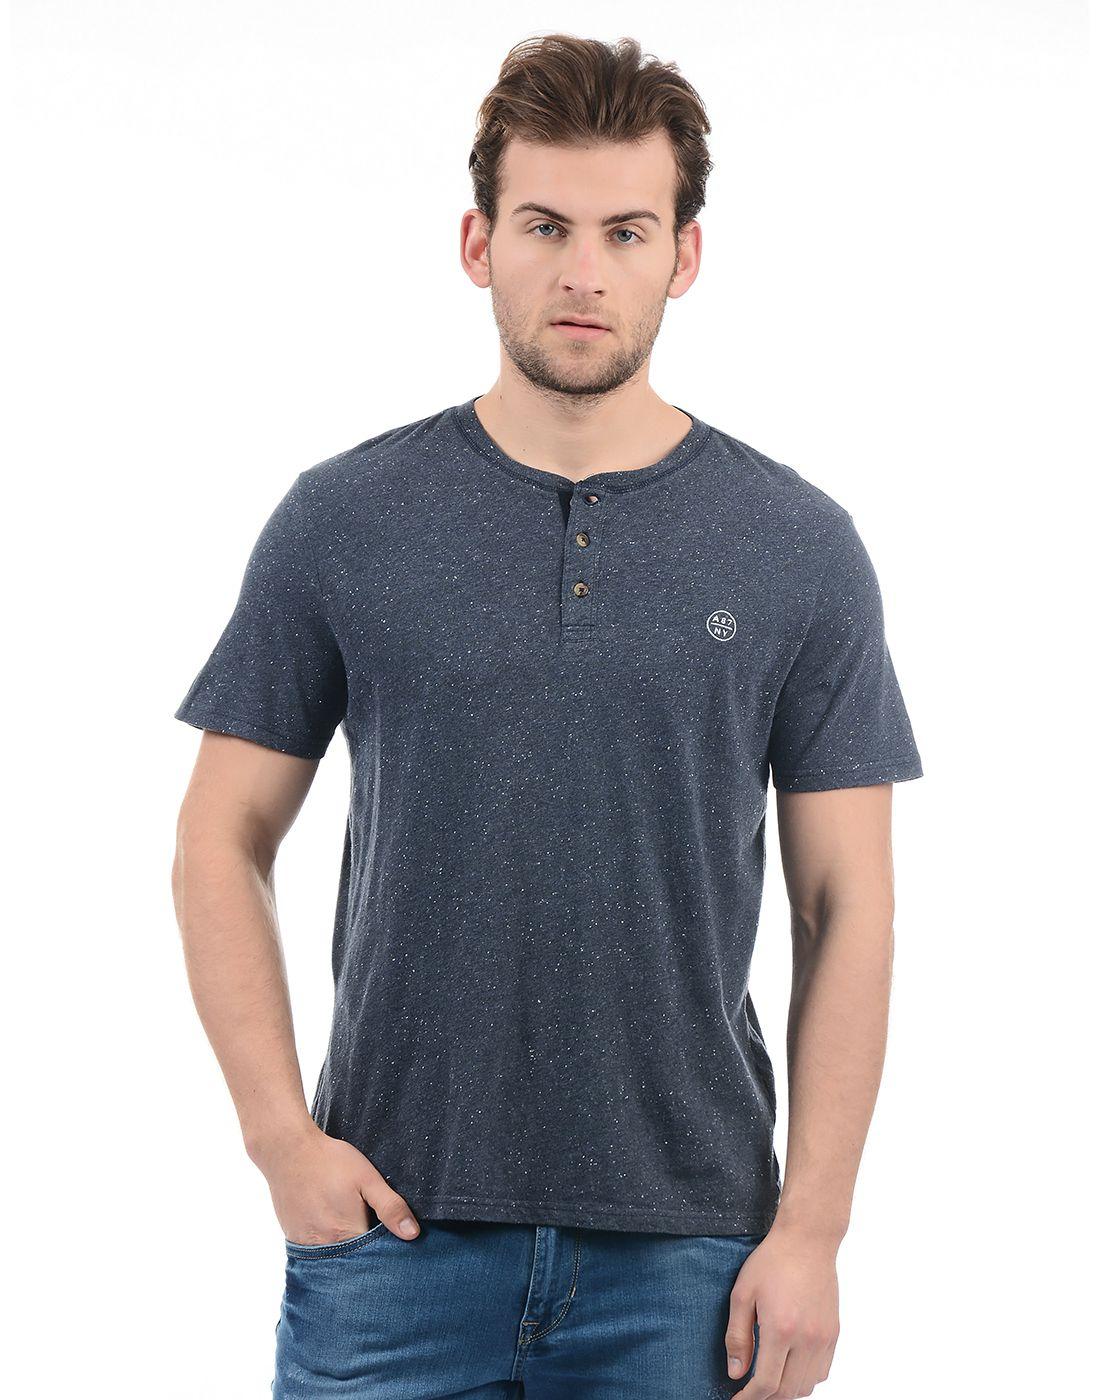 Aeropostale Navy Round T-Shirt